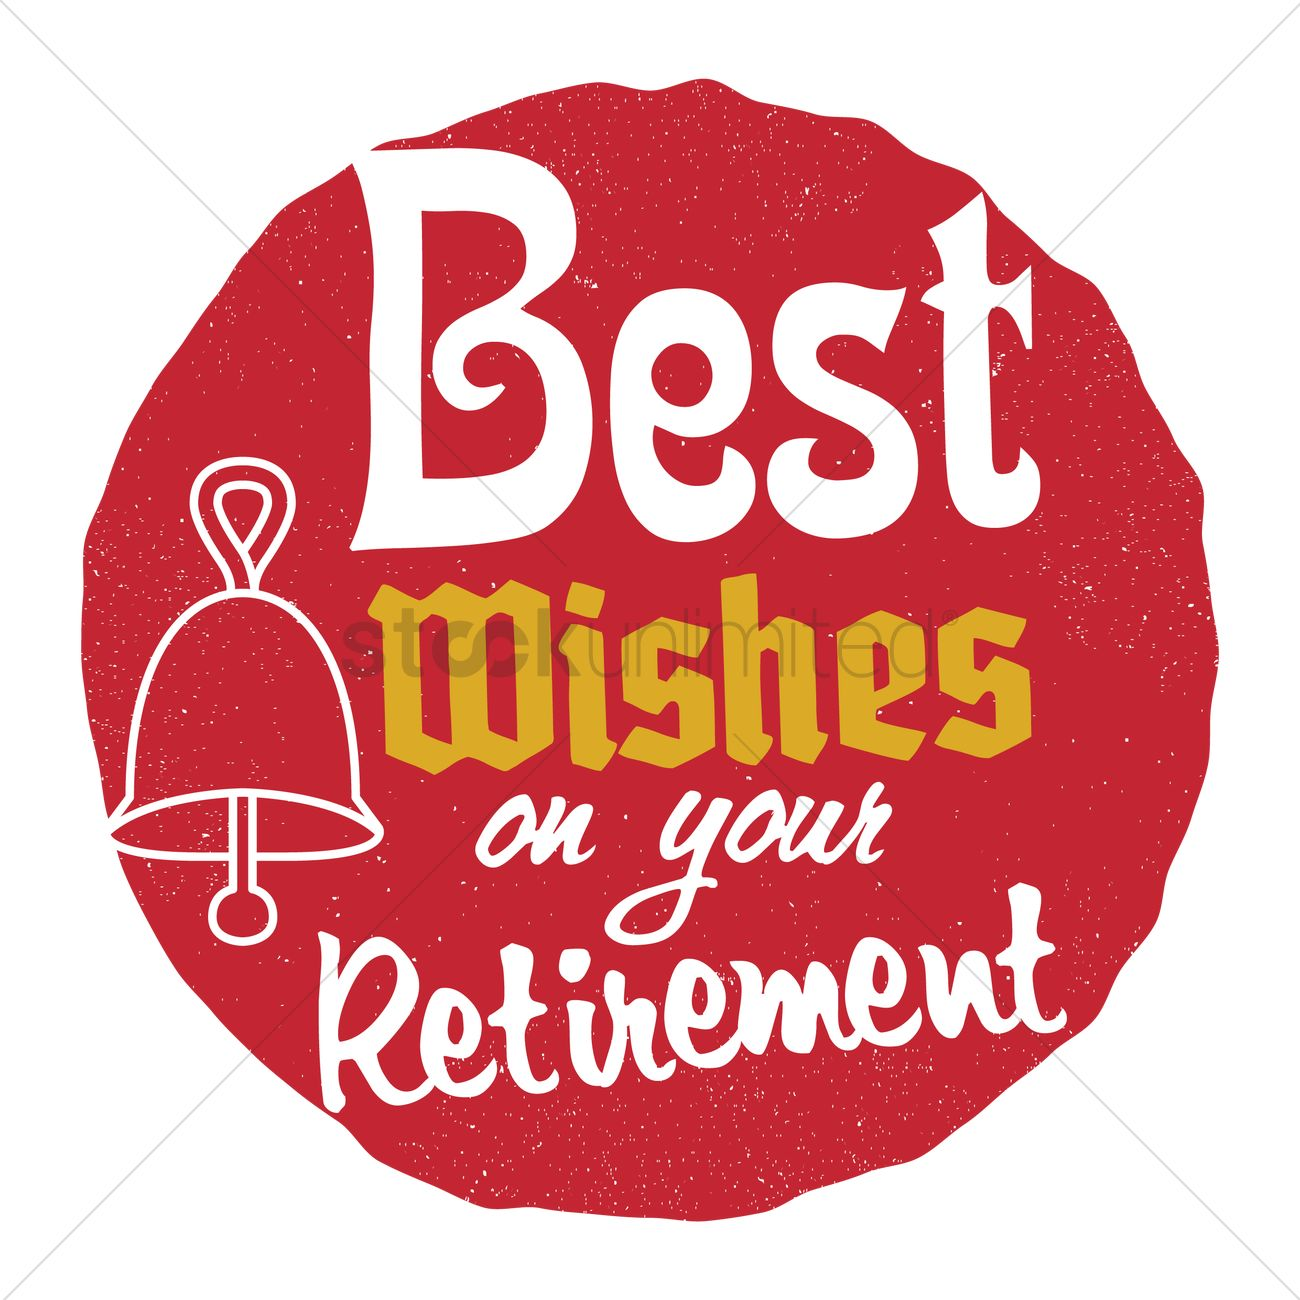 Happy retirement wish vector image 1827662 stockunlimited happy retirement wish vector graphic kristyandbryce Images